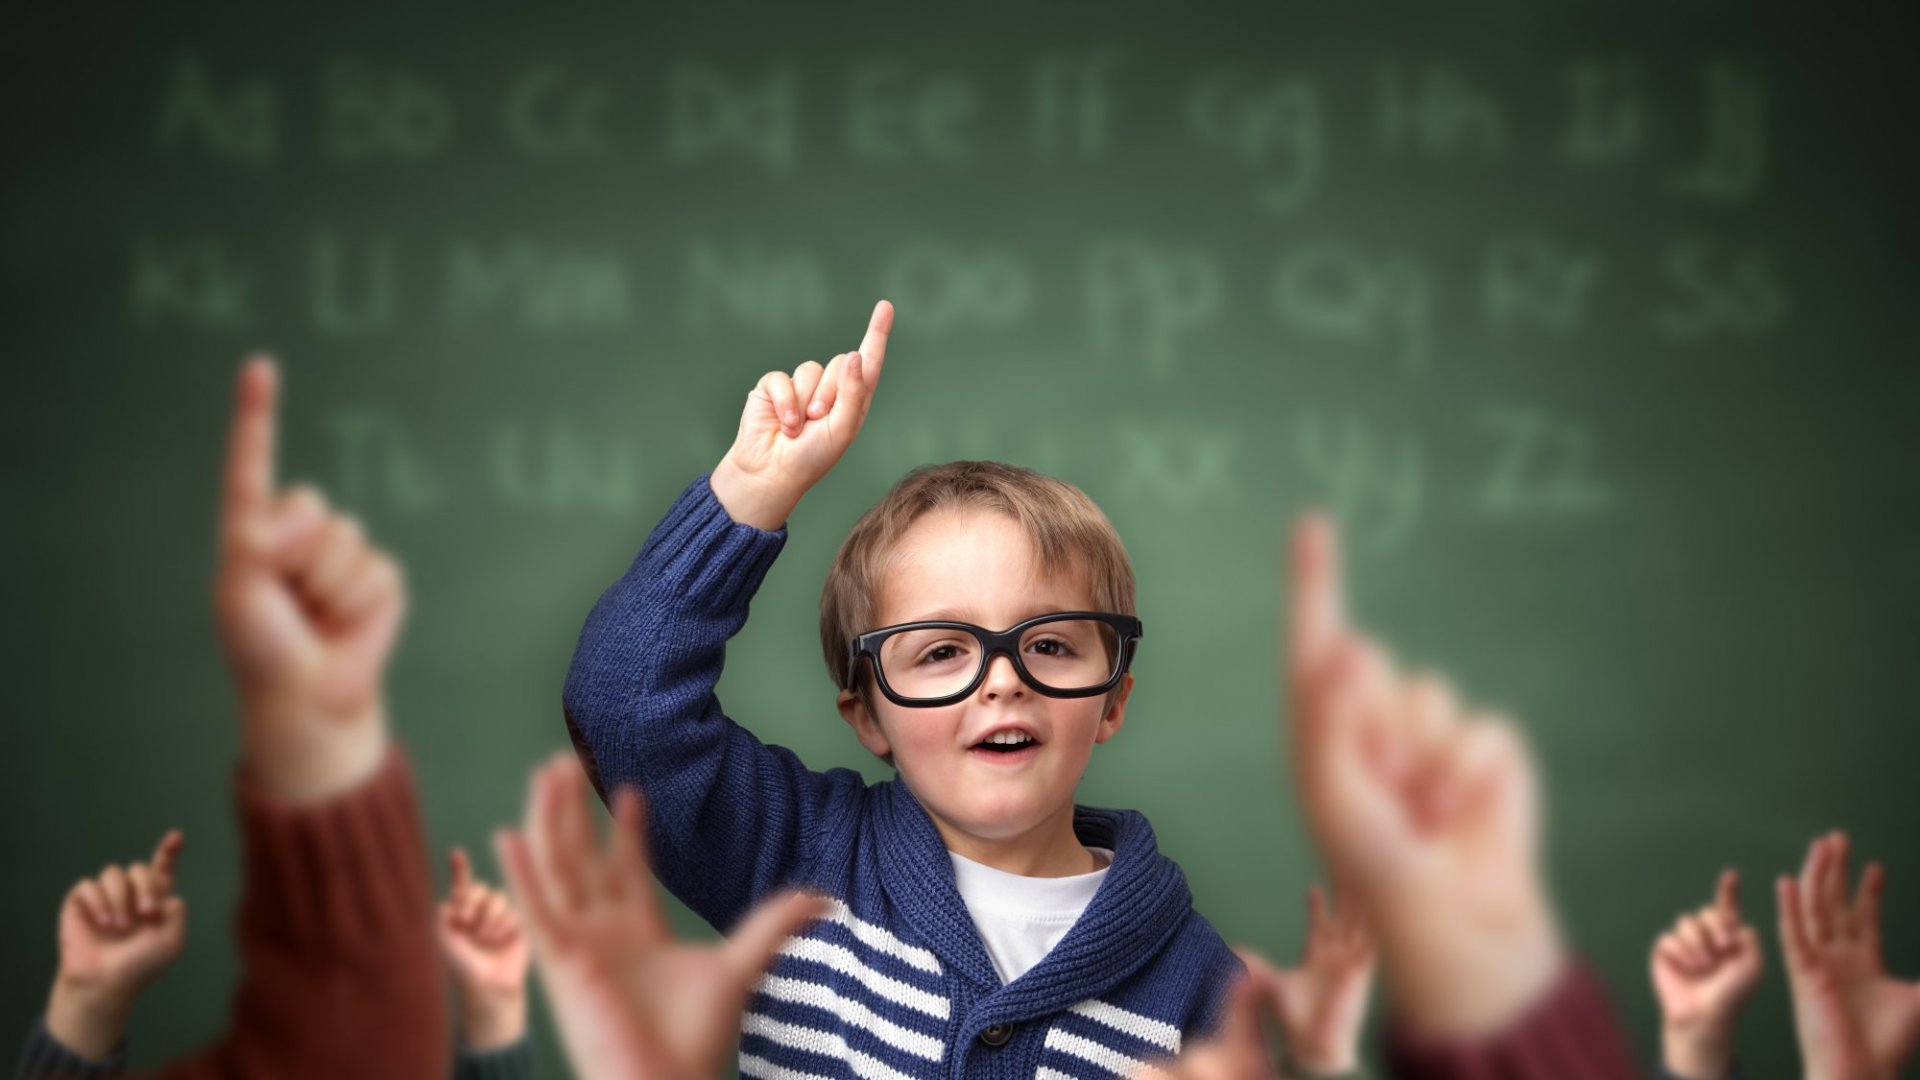 Leadership Development In Children